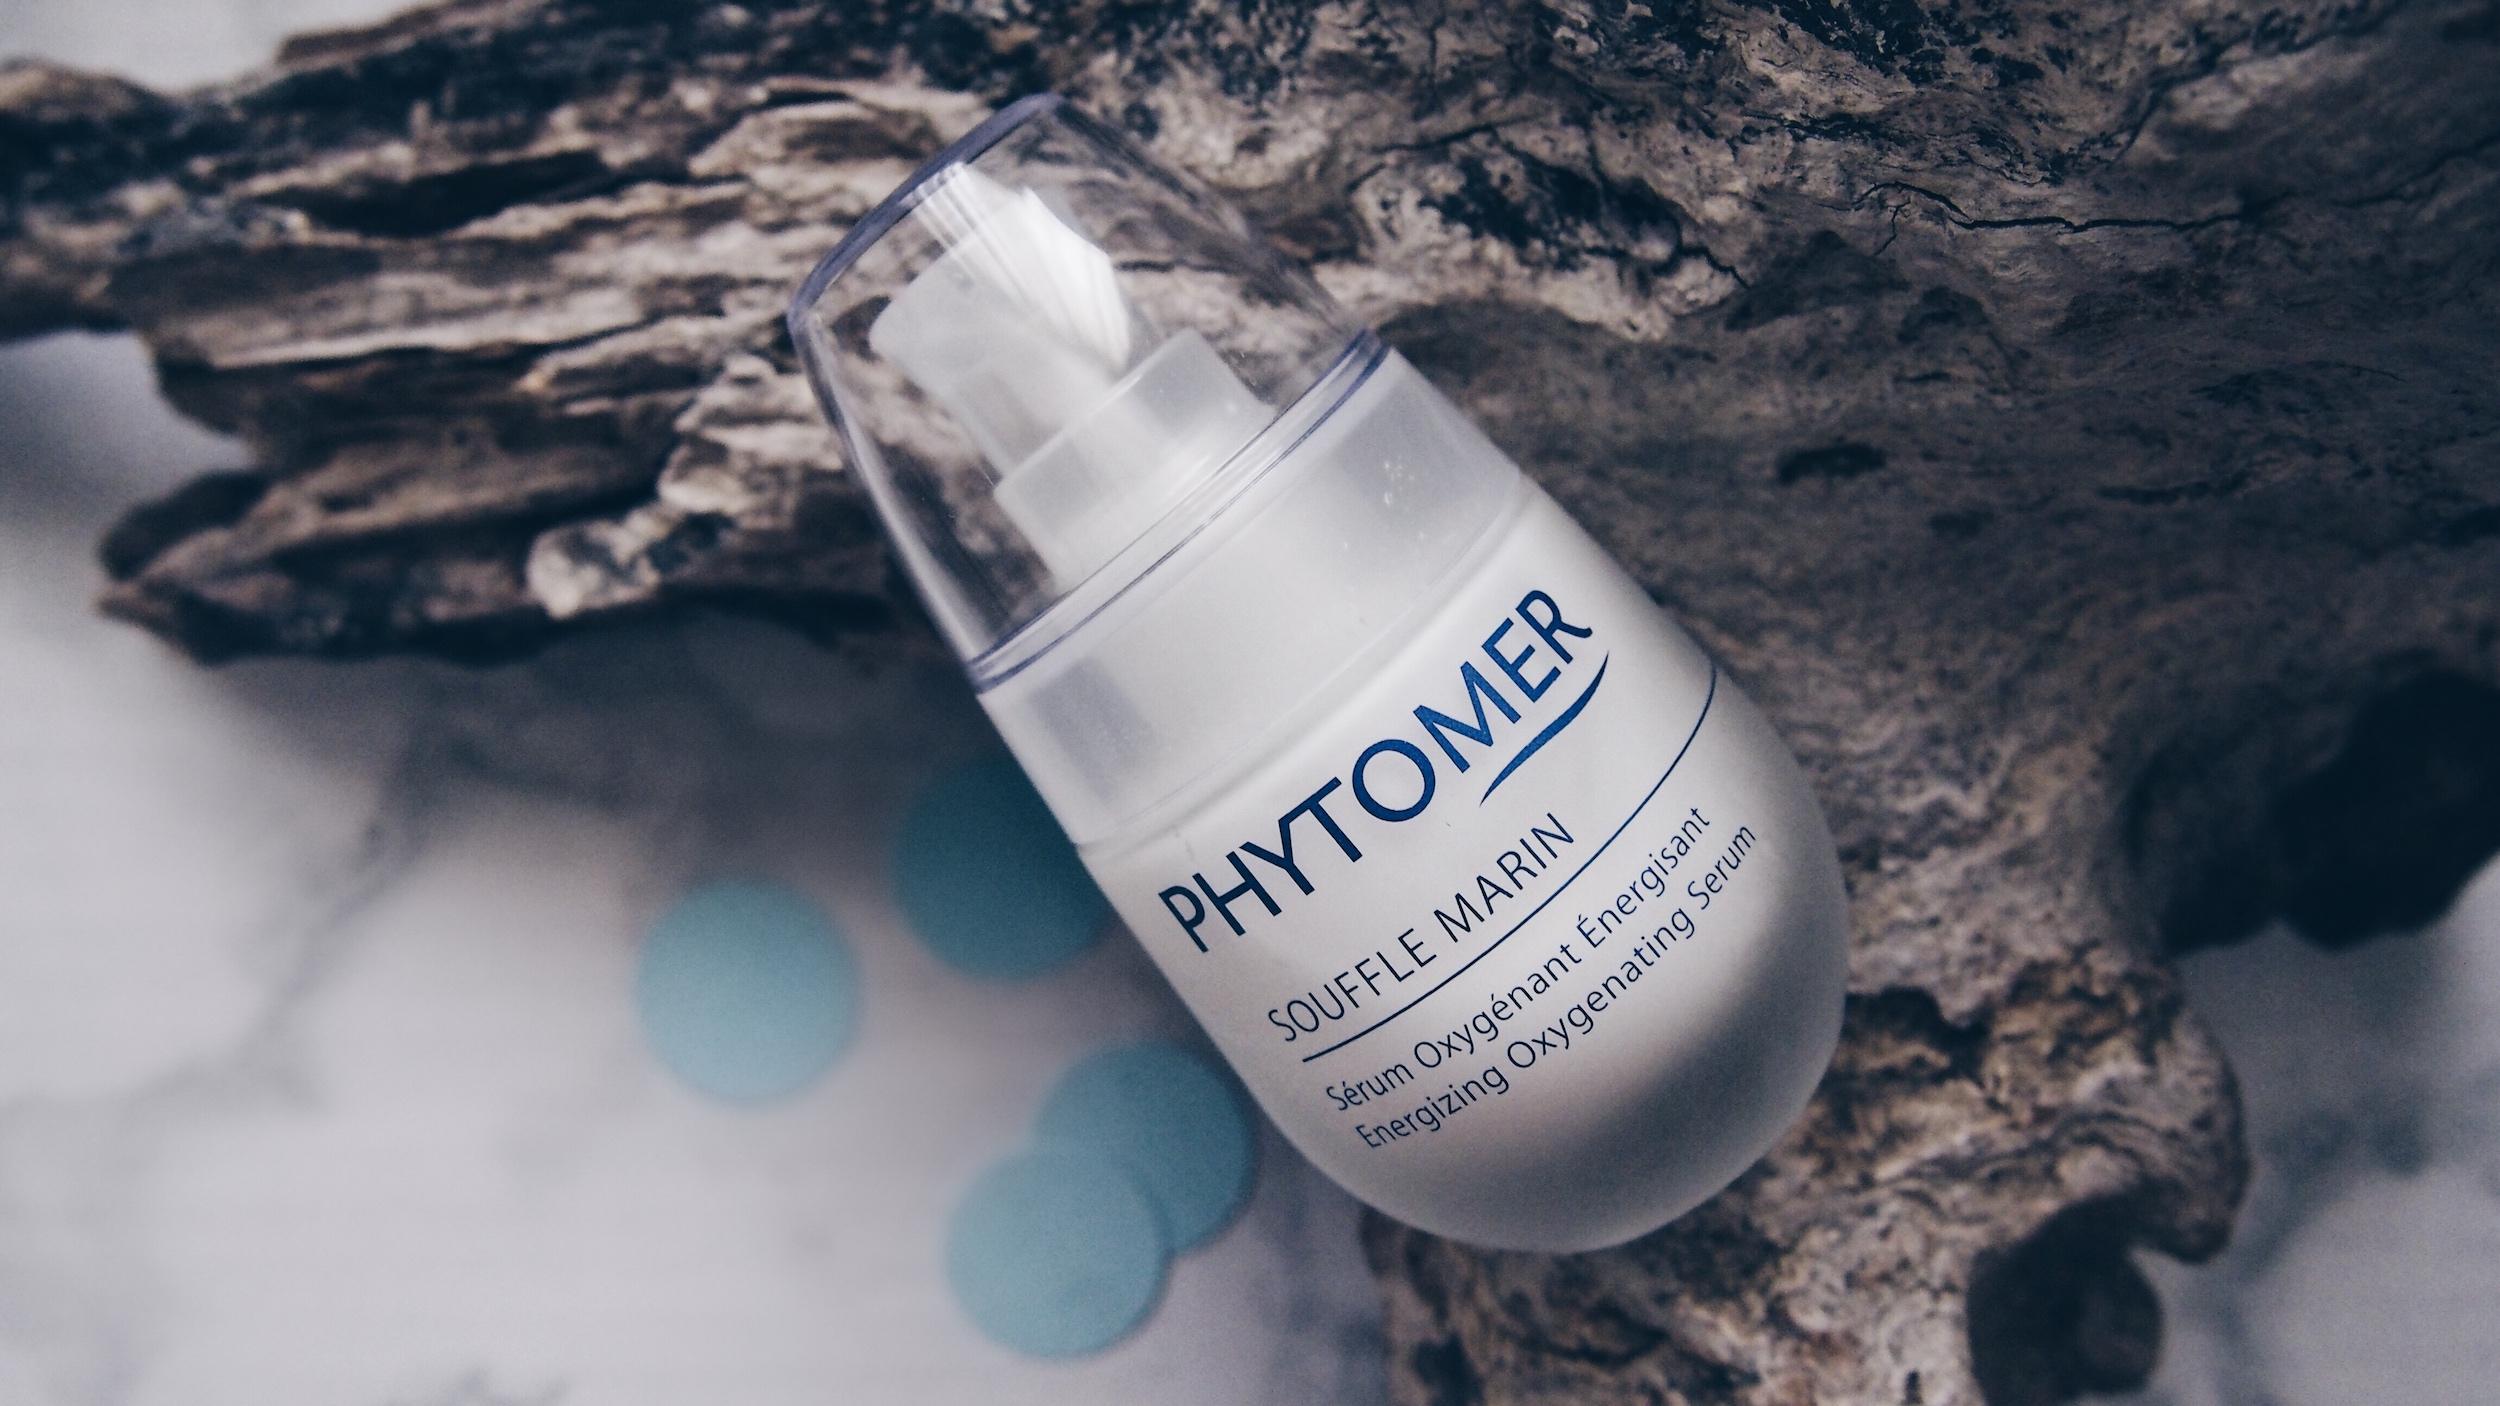 phytomer_serum_marin_hydratation_